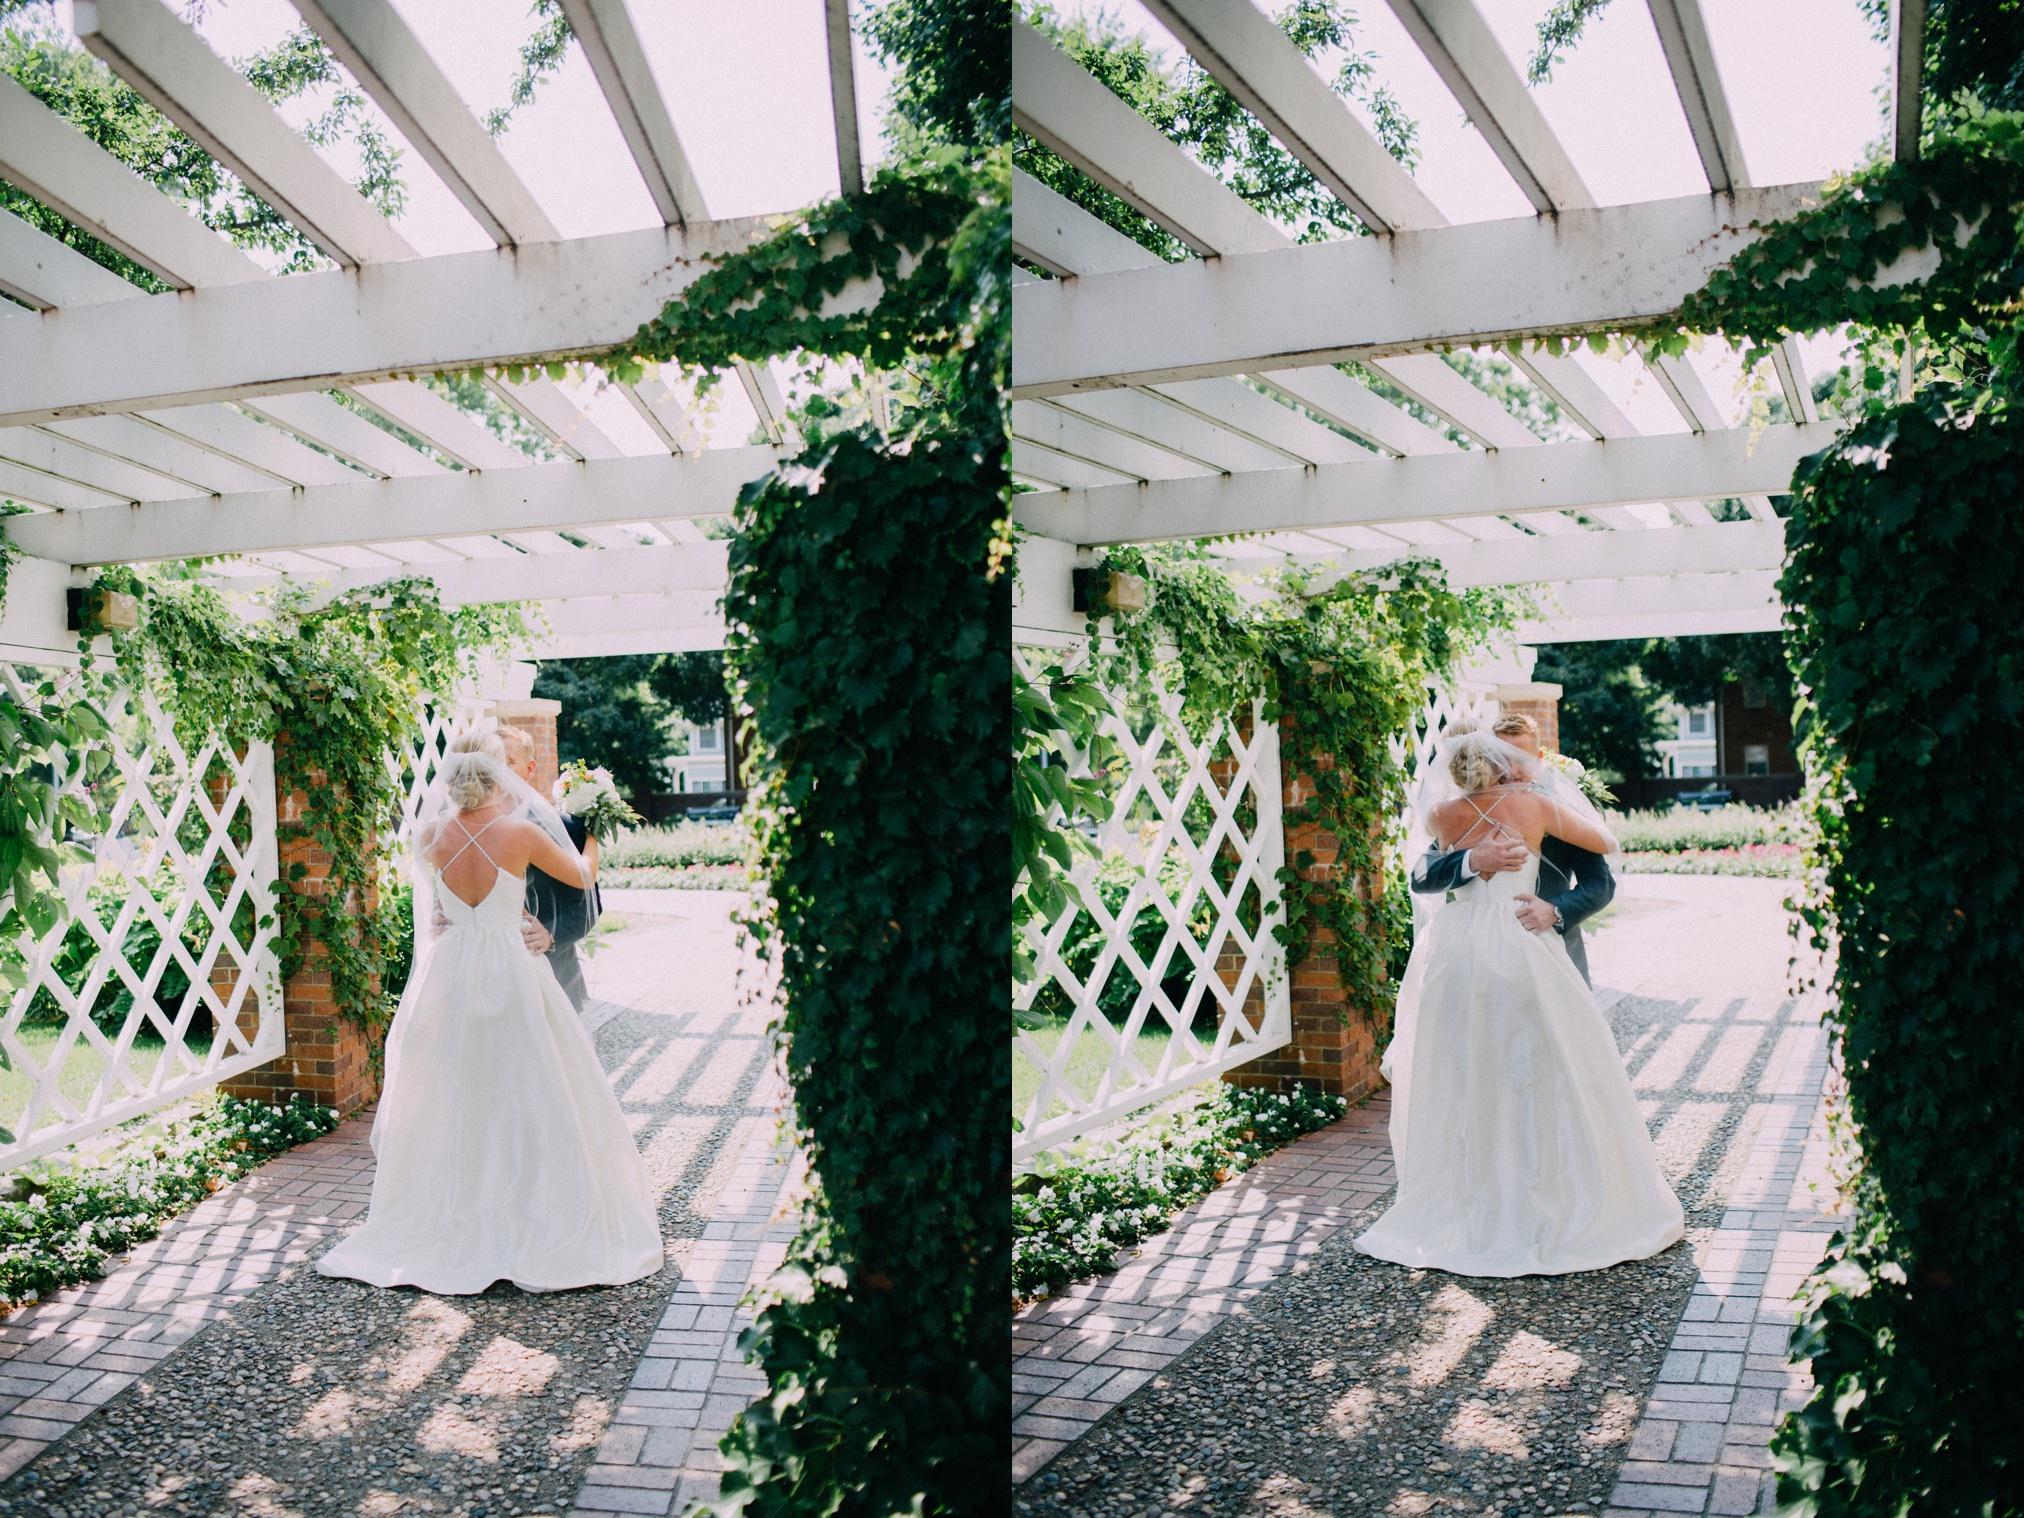 brenna+michael_wedding-246.jpg